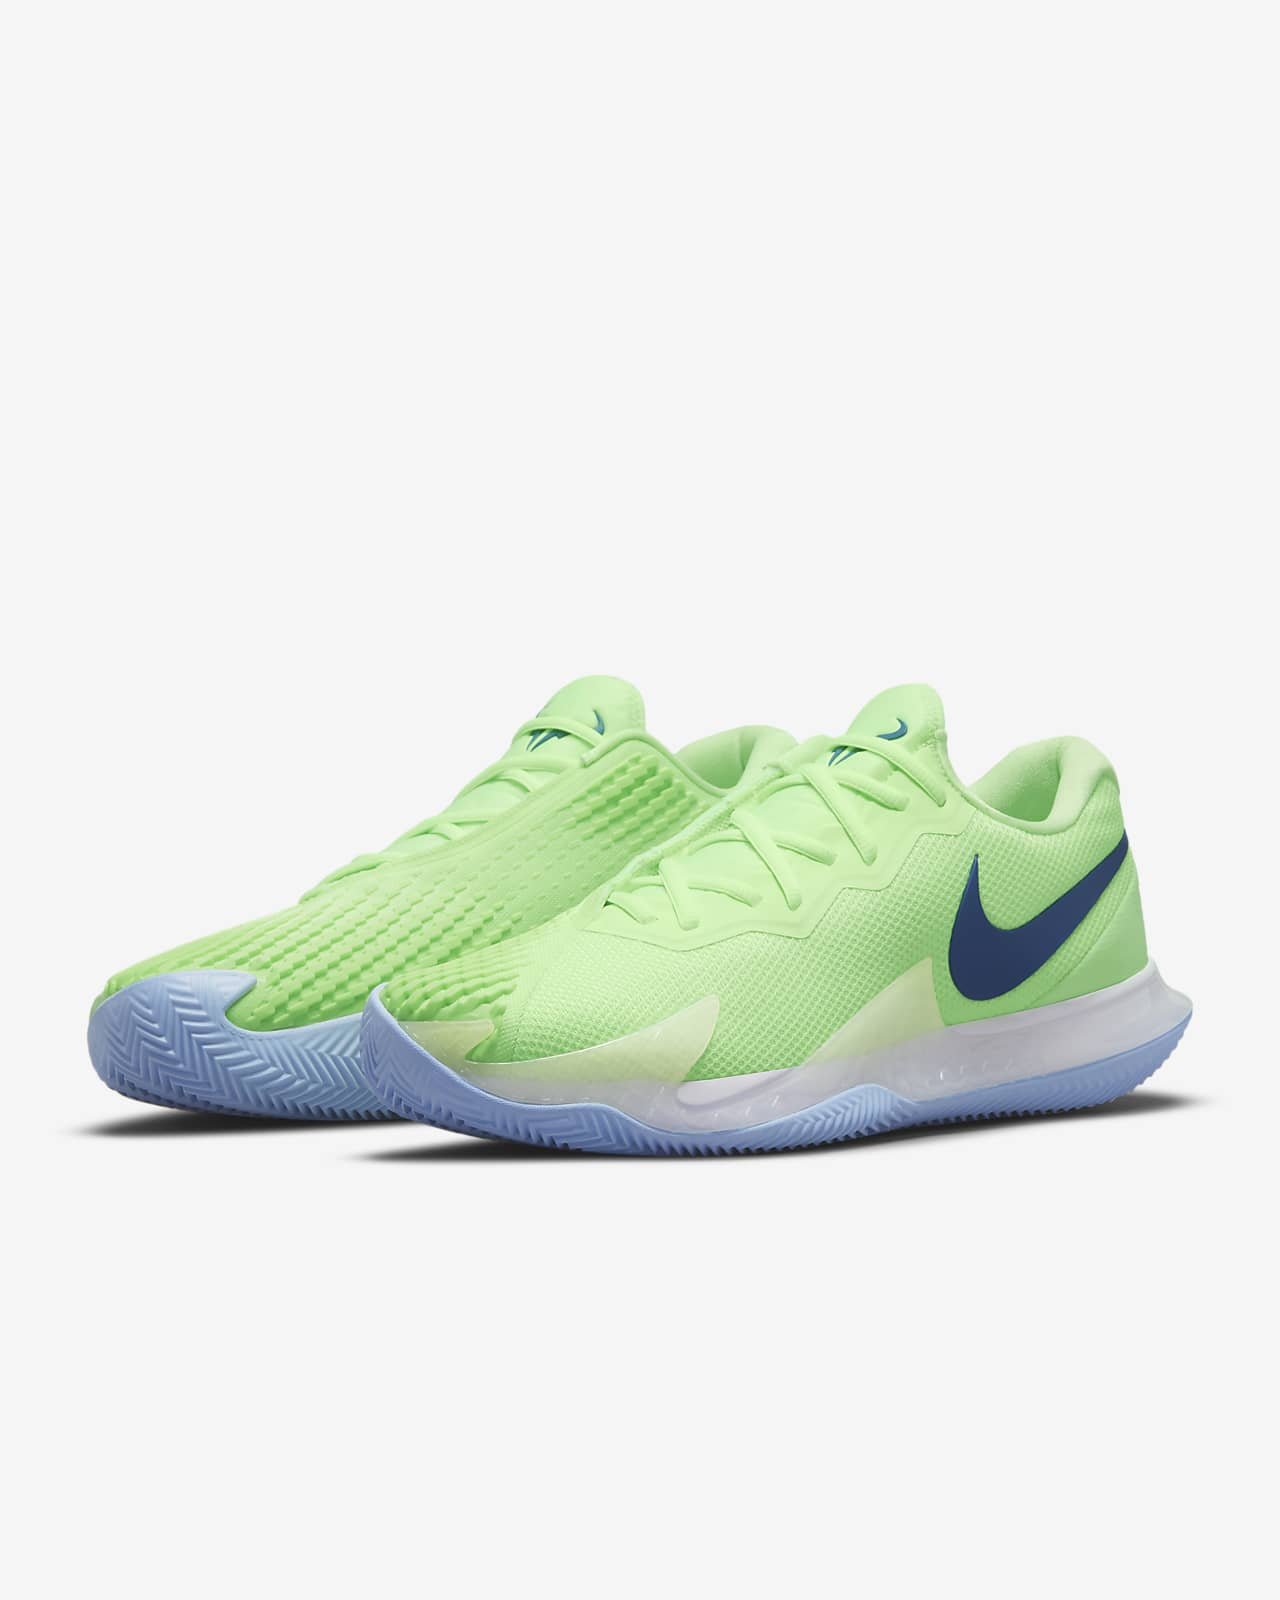 NikeCourt Air Zoom Vapor Cage 4 Rafa Men's Clay Court Tennis Shoe ...